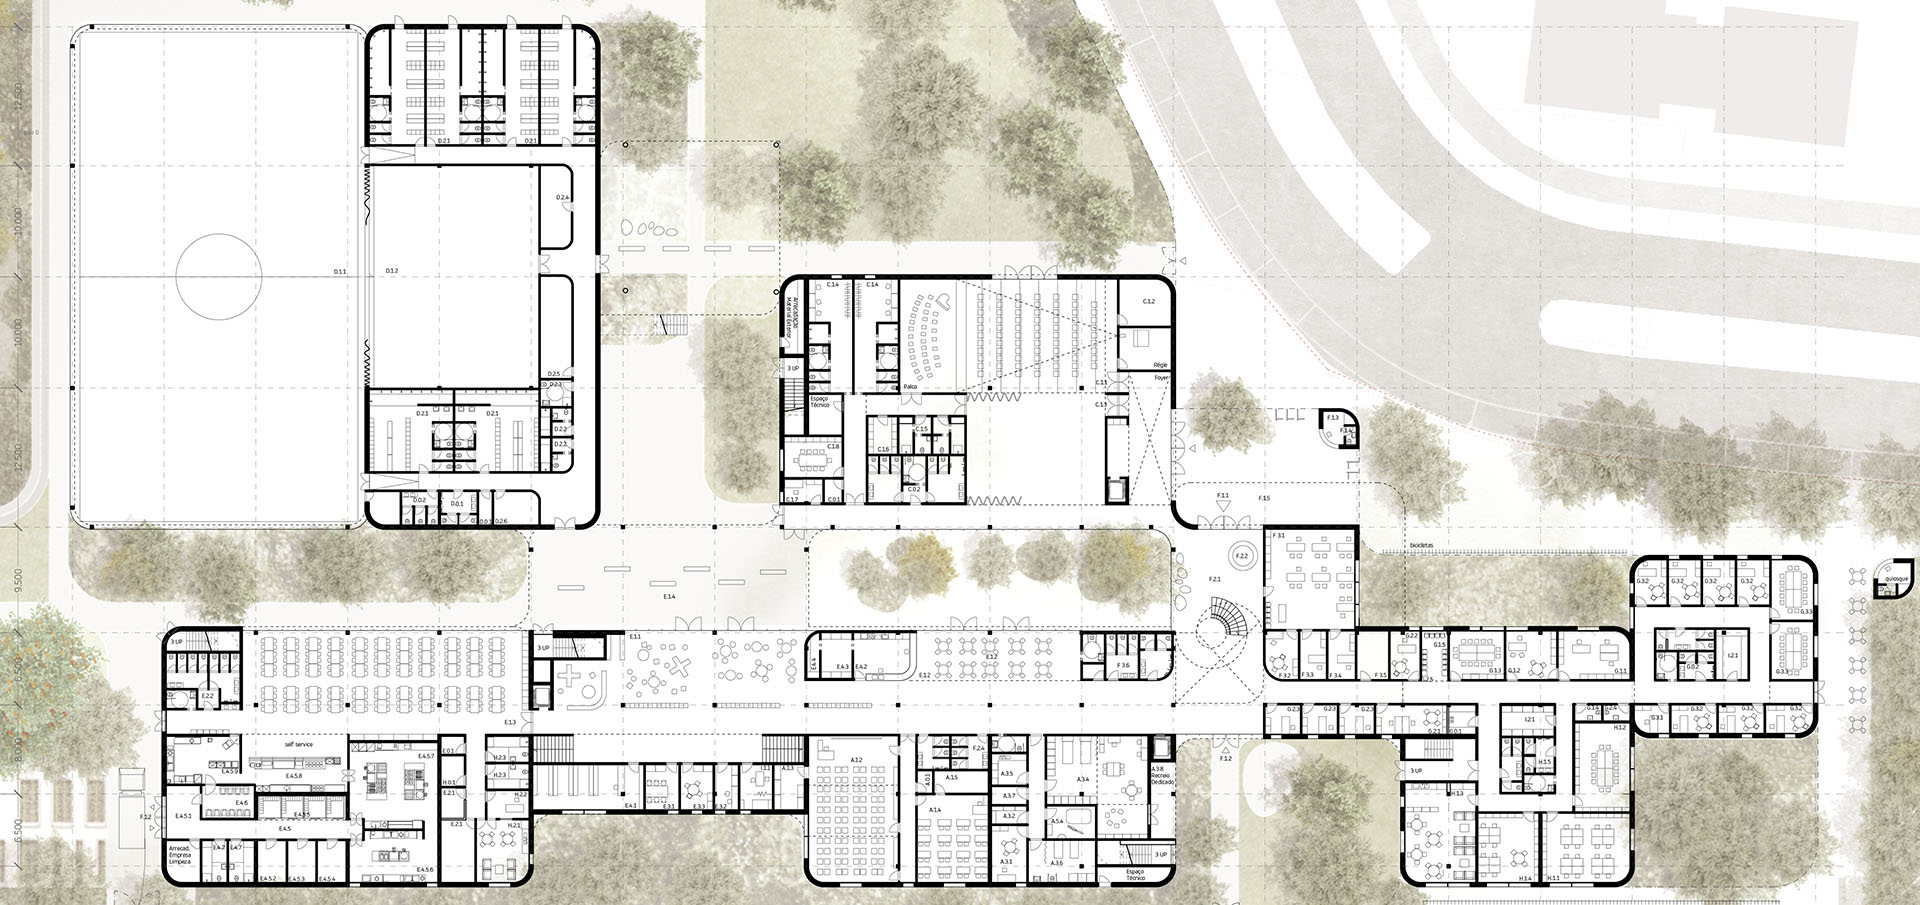 sastudio tiago sá architecture arquitetura cascais